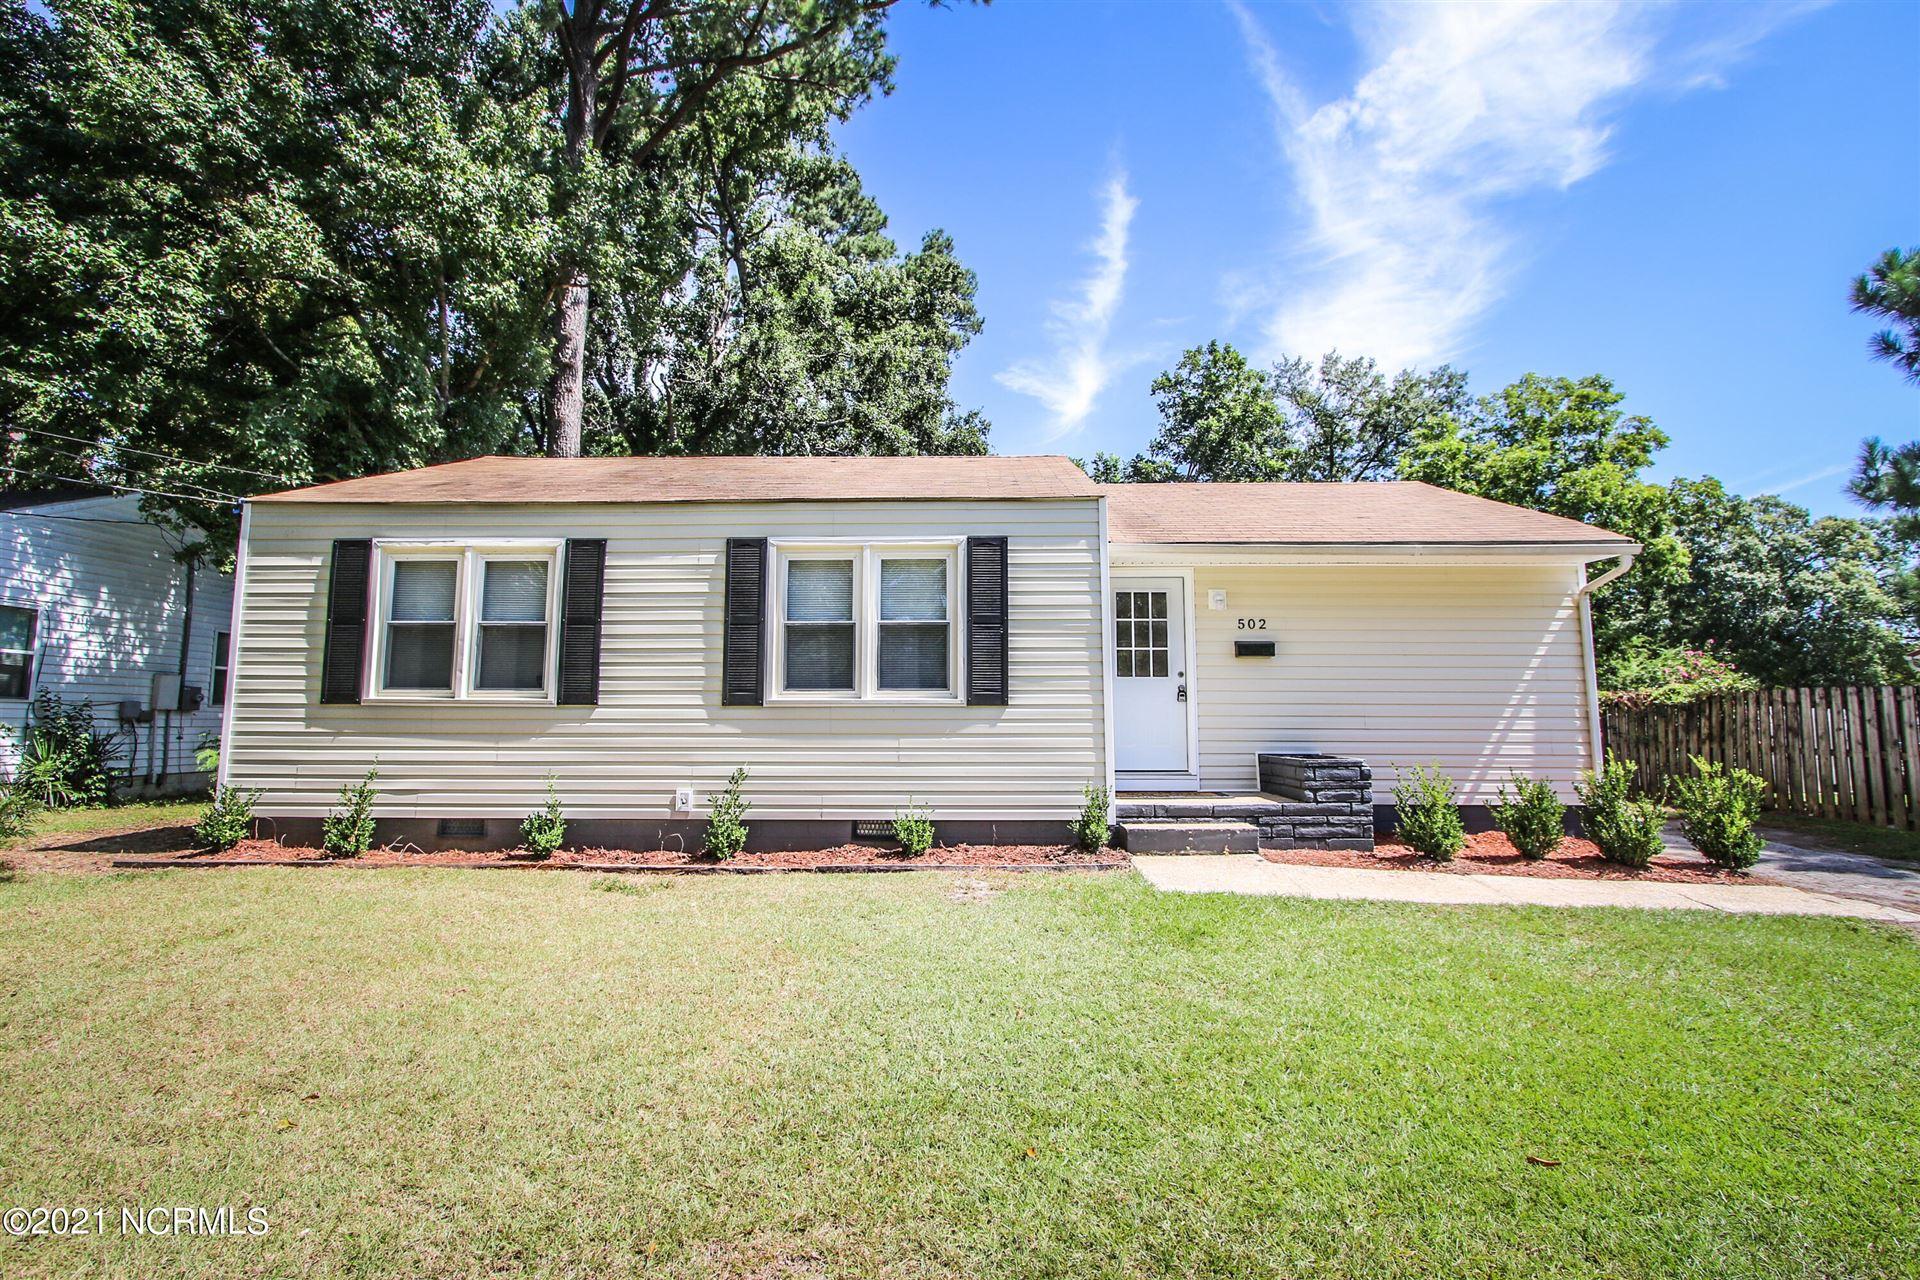 Photo of 502 Oak Lane, Jacksonville, NC 28540 (MLS # 100289343)